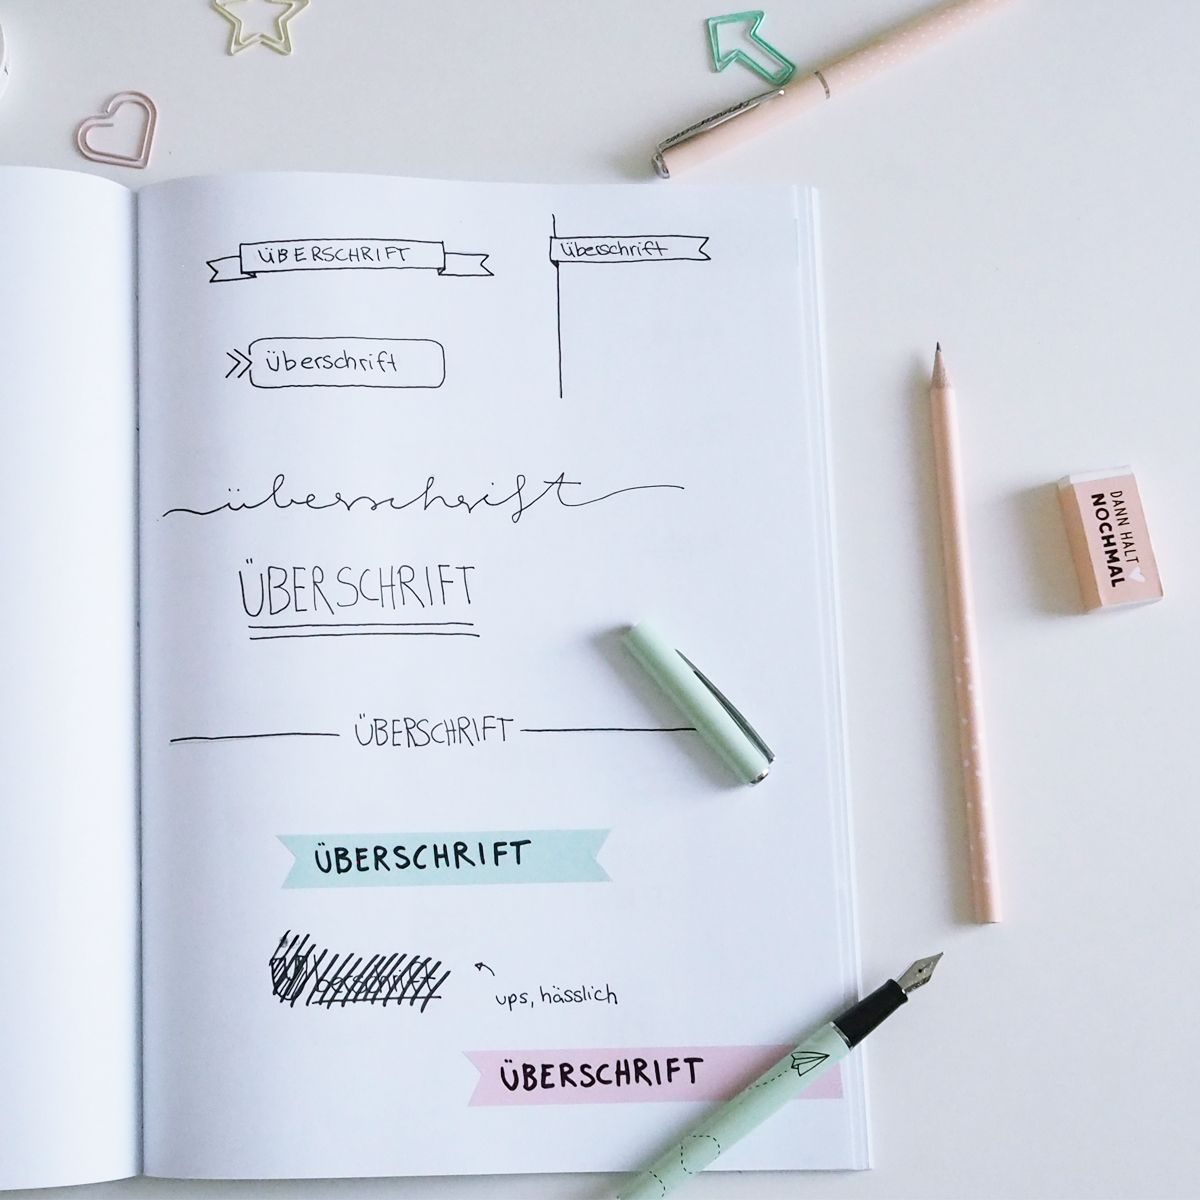 Tipps und ideen f r eine kreative heftgestaltung bujo pinterest journal ideen berschrift - Fotoalbum dekorieren ...